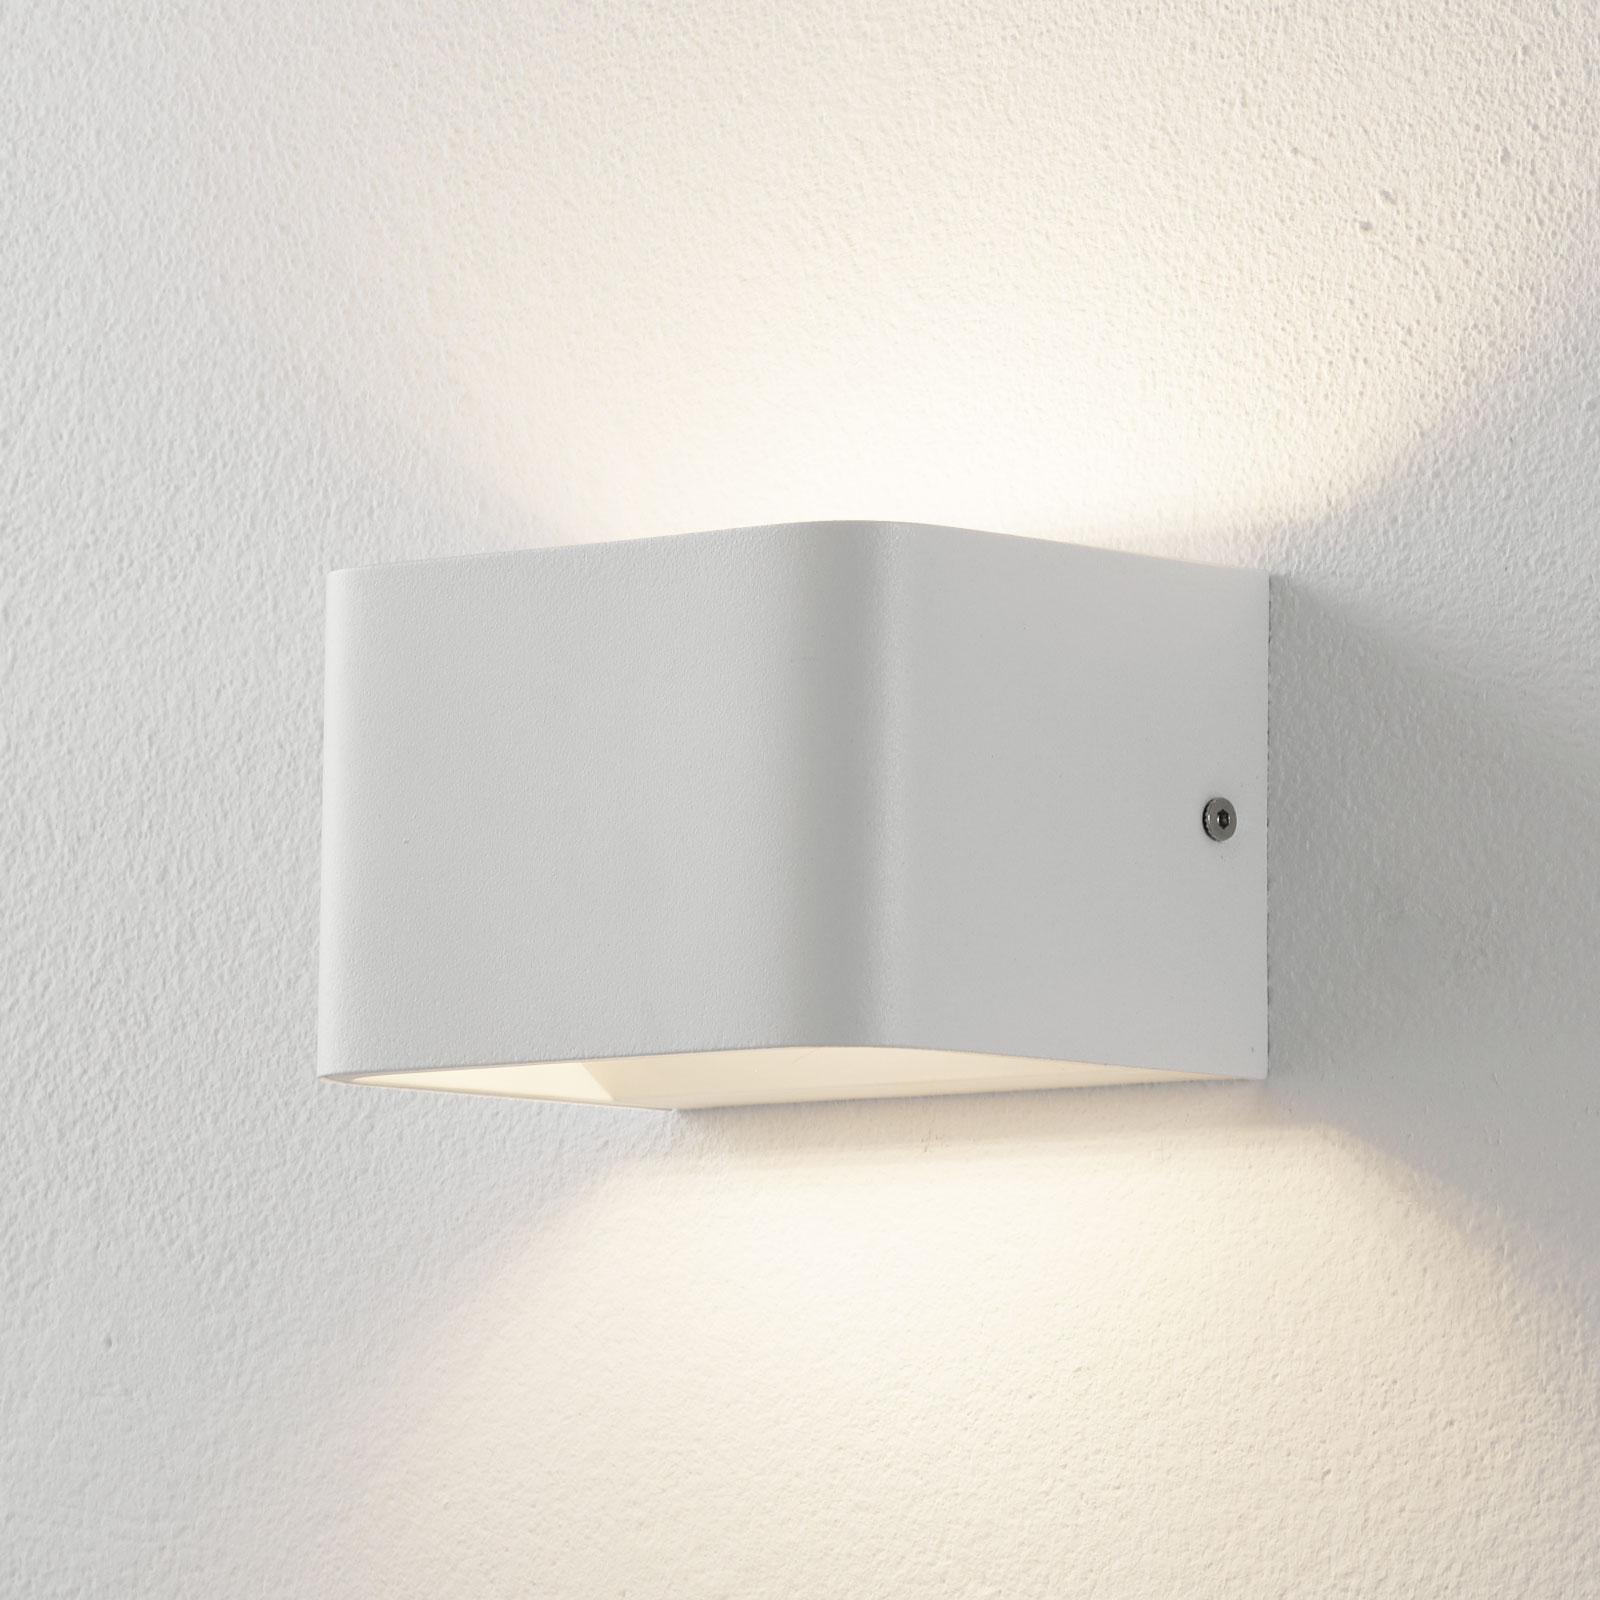 Lucande Sessa LED wandlamp 13cm wit